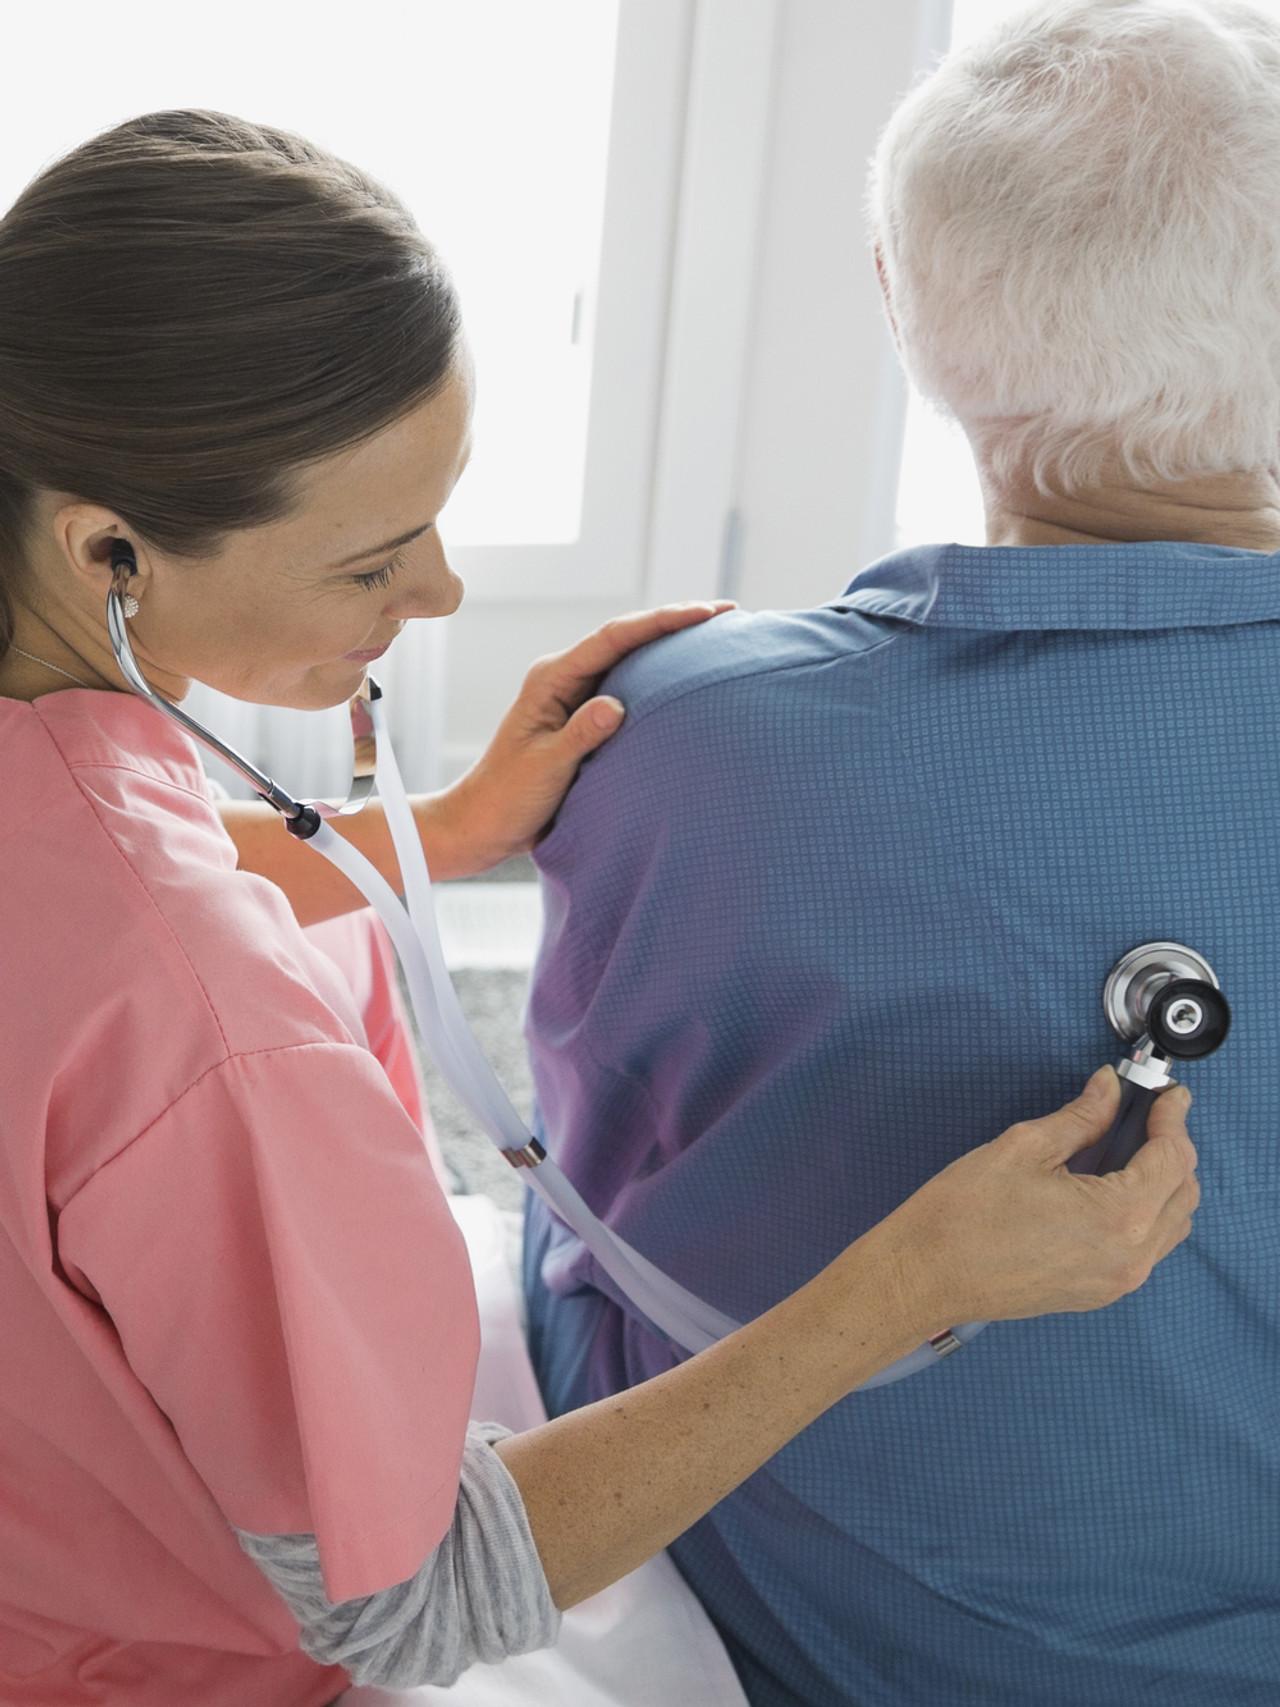 Gen X caring for aging elderly parents